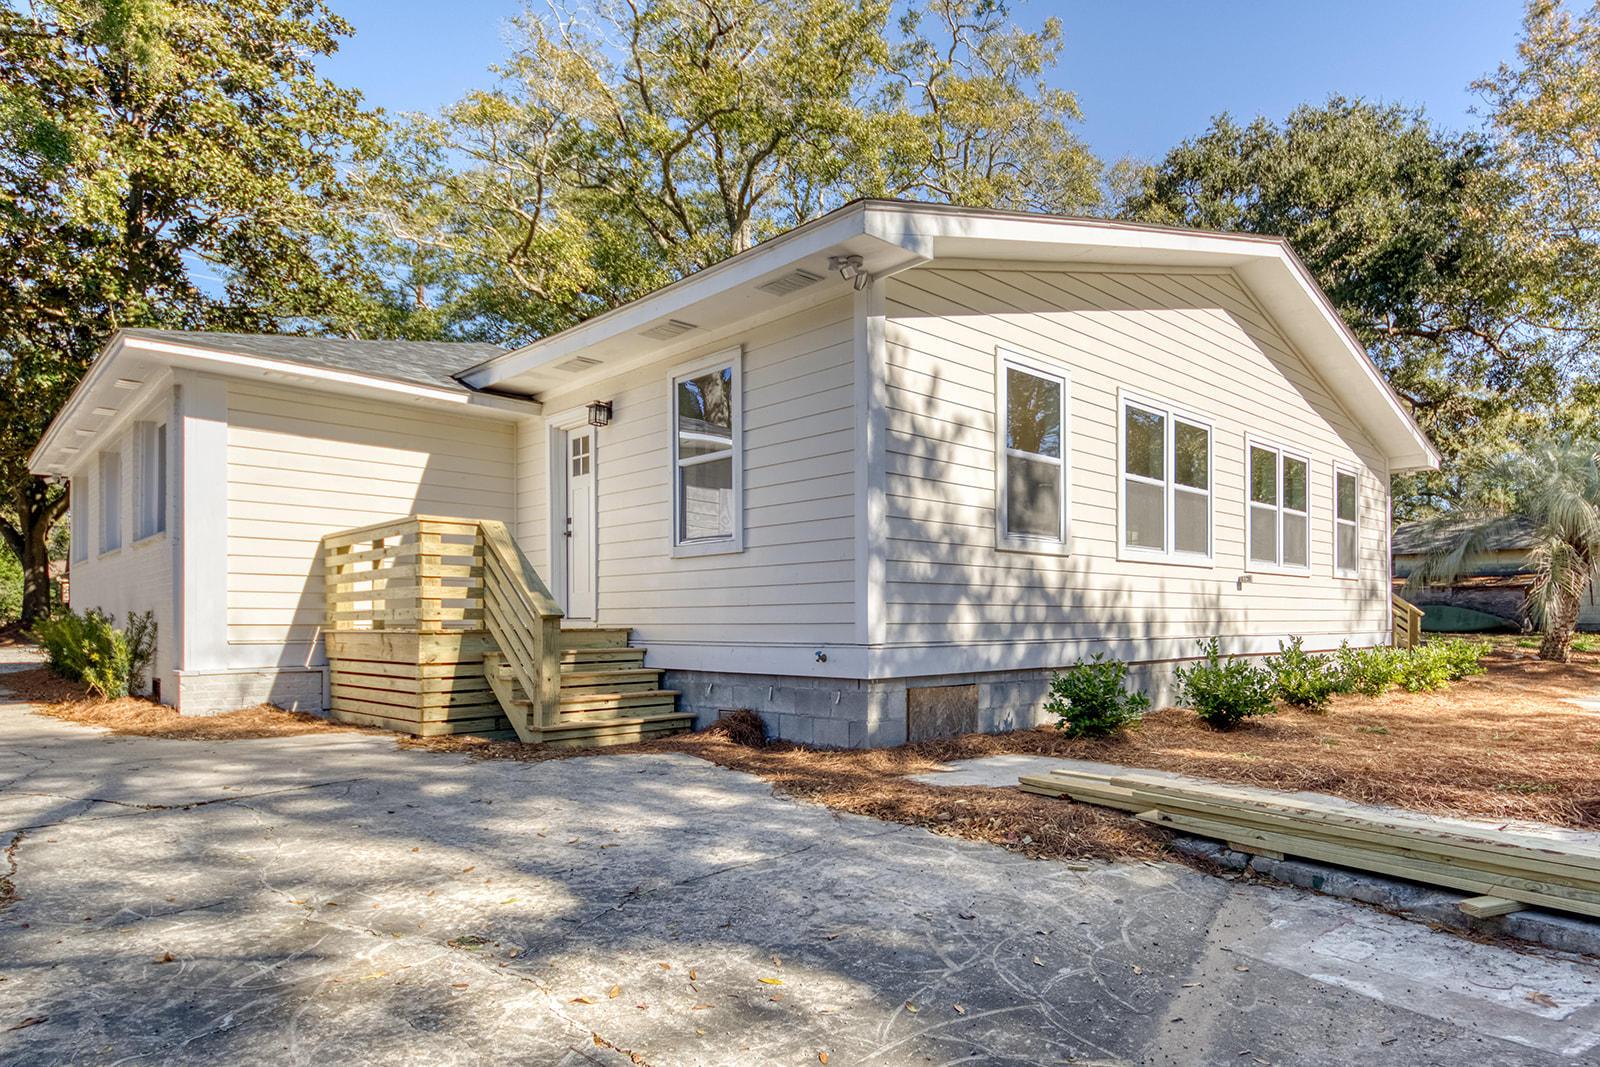 Bay View Acres Homes For Sale - 265 Coleman, Mount Pleasant, SC - 24